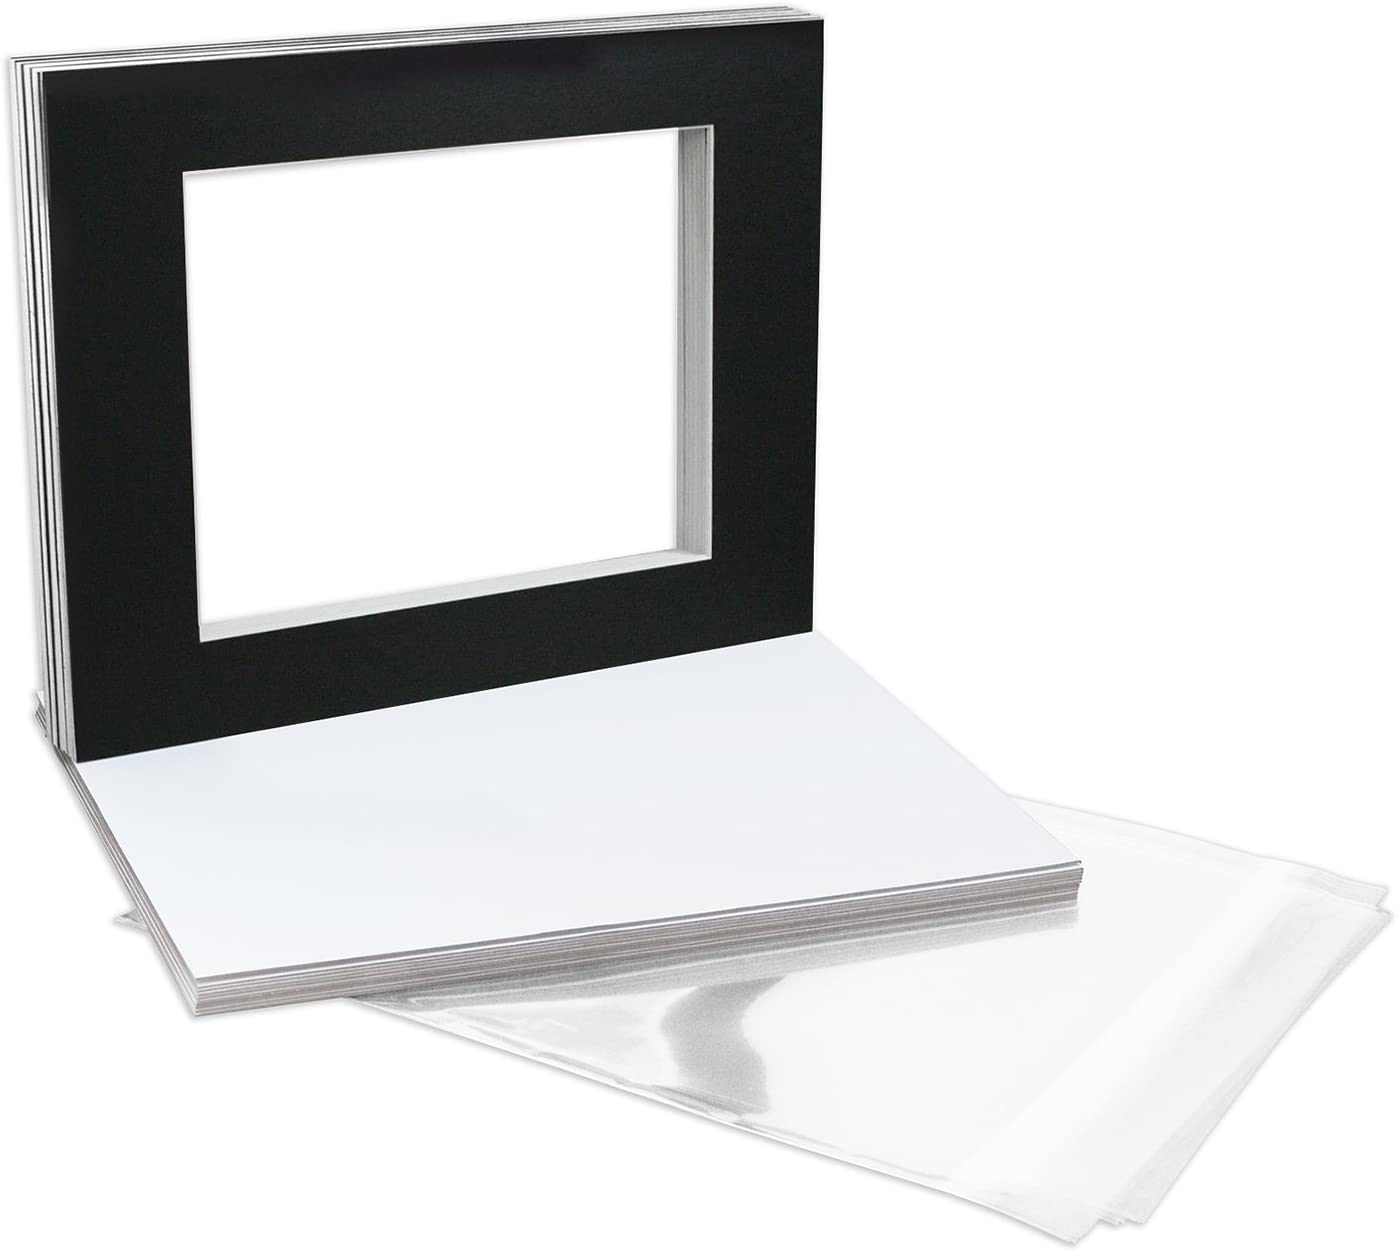 White Golden State Art 50 11x14 Backing Board